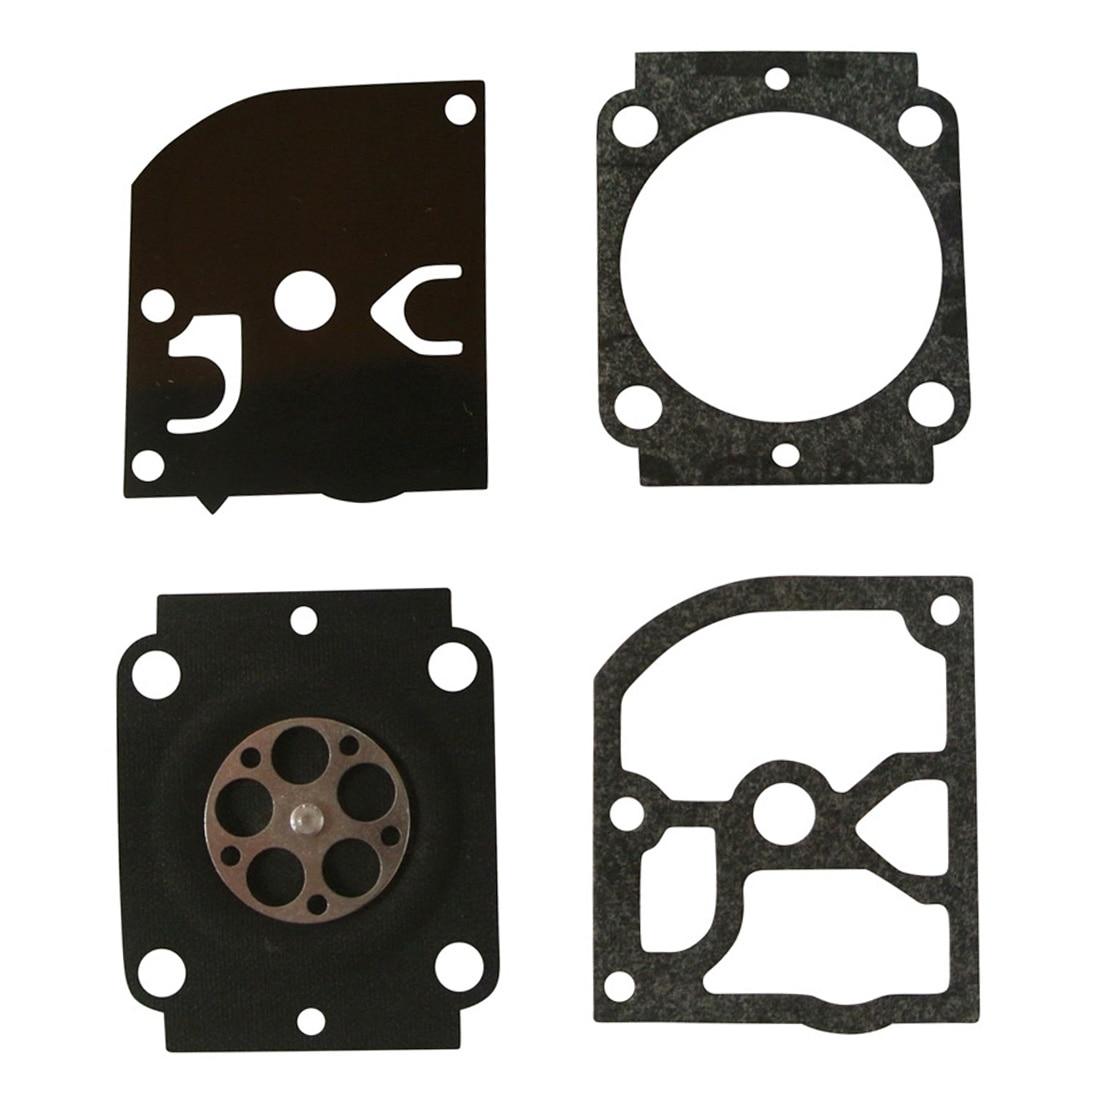 Tools : CARB REBUILD KIT FOR STIHL BLOWER BG66 BG86 For ZAMA C1M RB 155 GND 88 S145 10Set